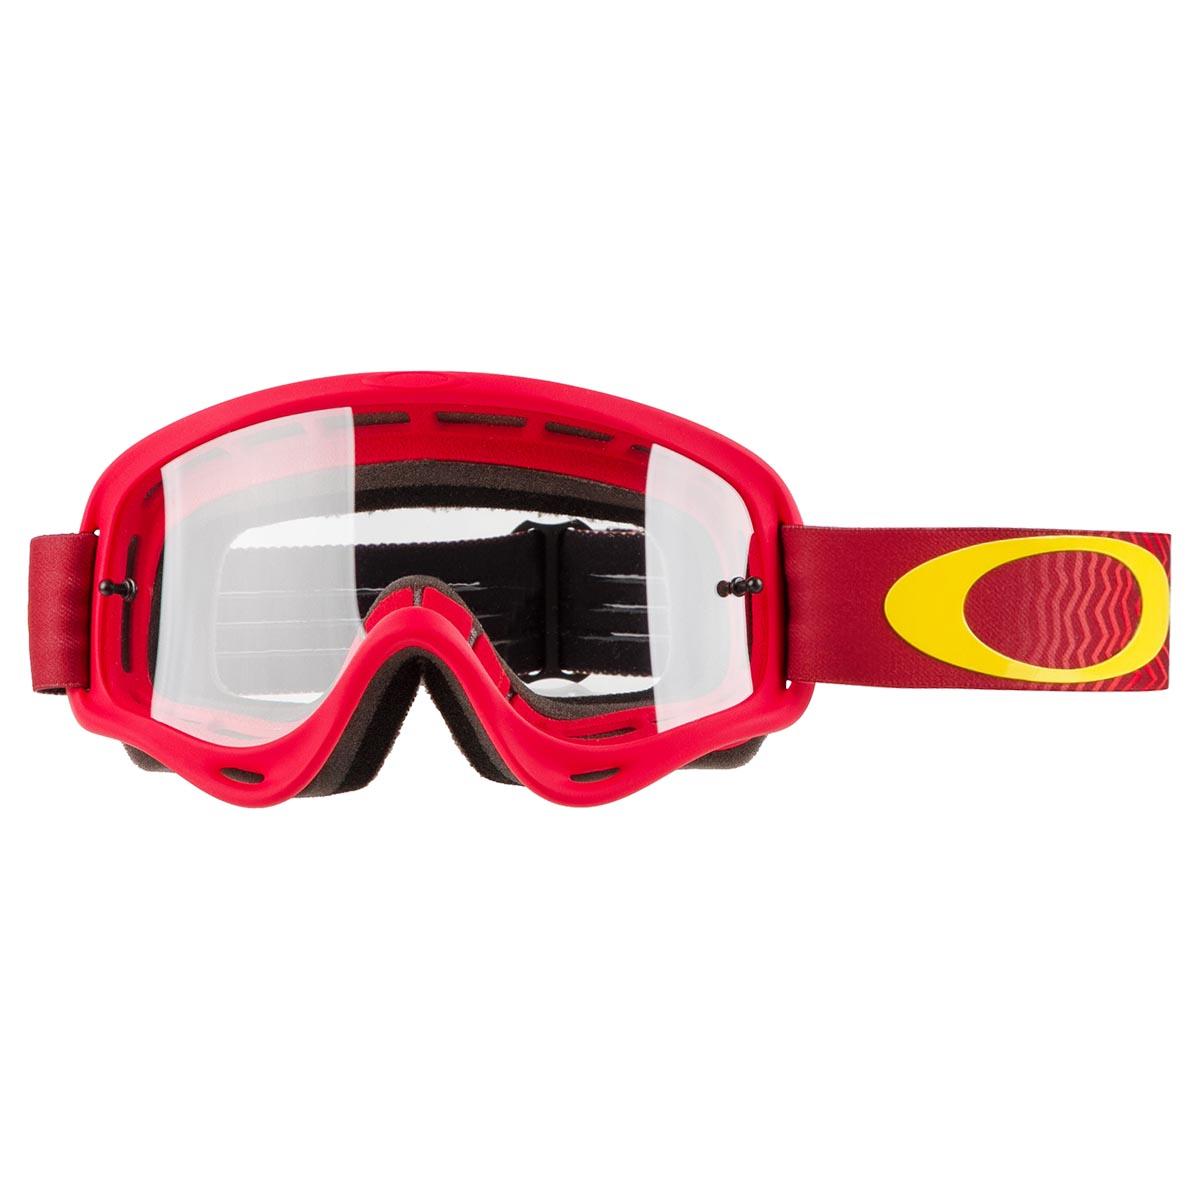 52f7a830f65 Oakley Kids Goggle XS O Frame Shockwave Red Yellow - Clear Anti-Fog ...